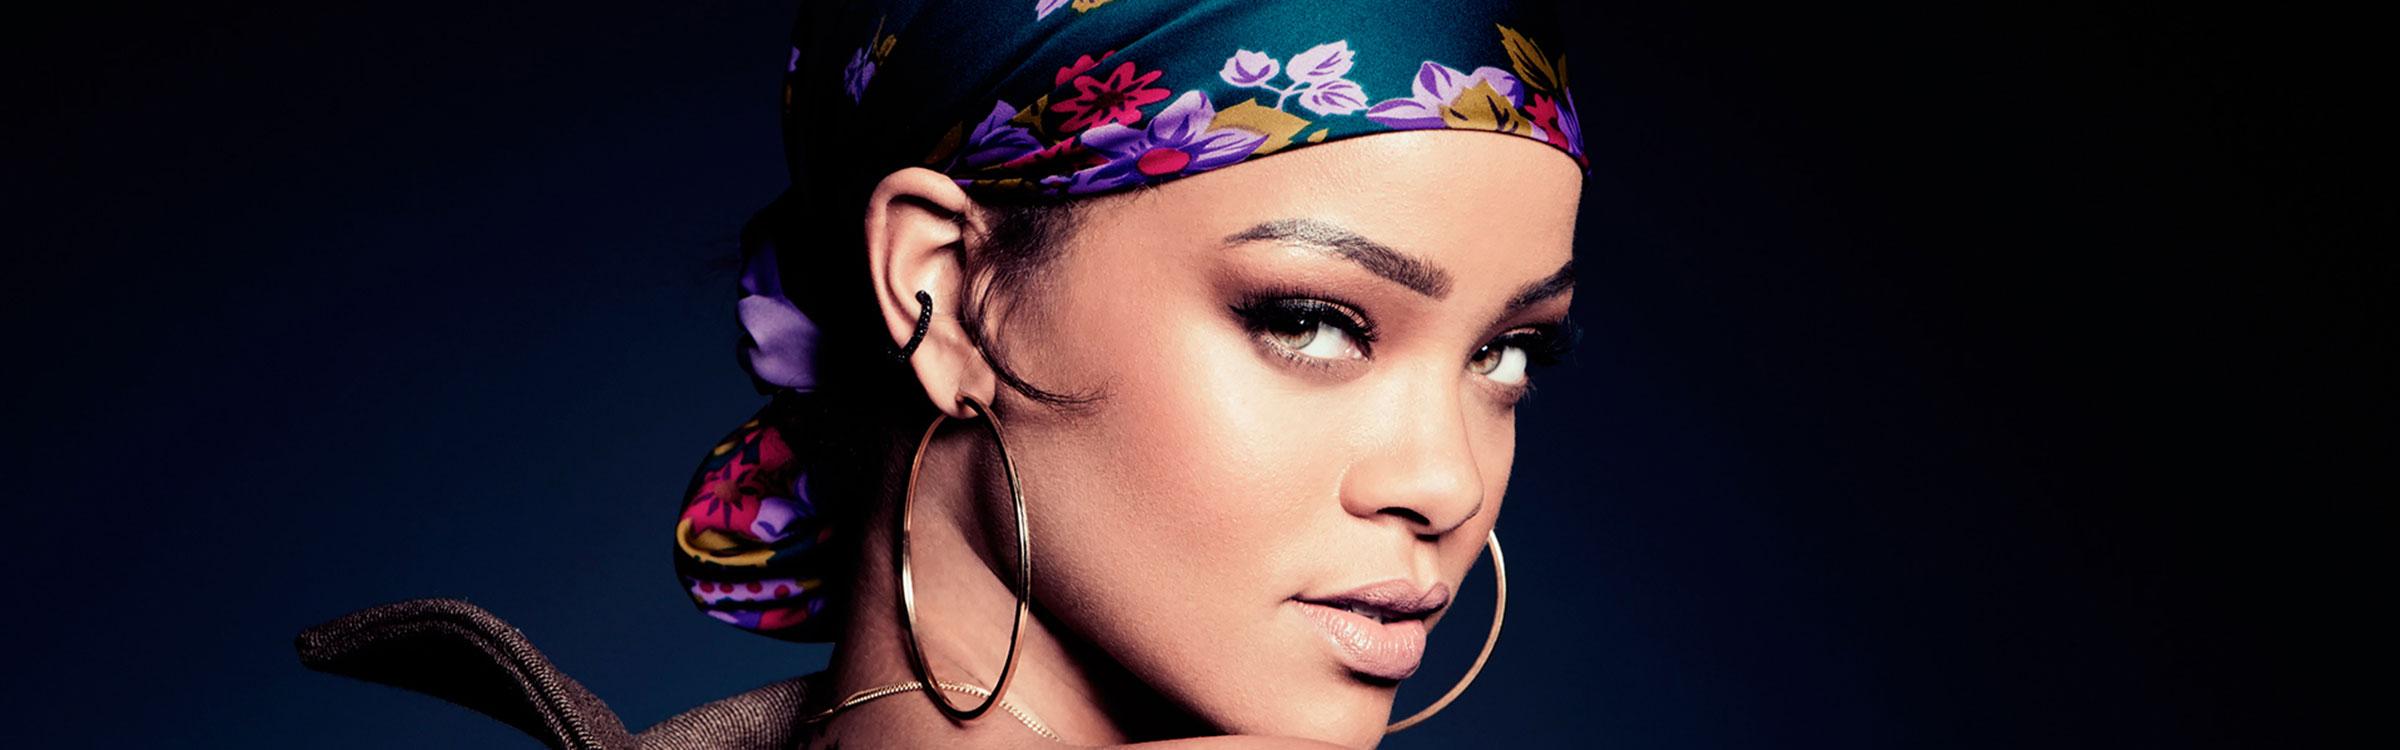 Rihanna 2015 hd